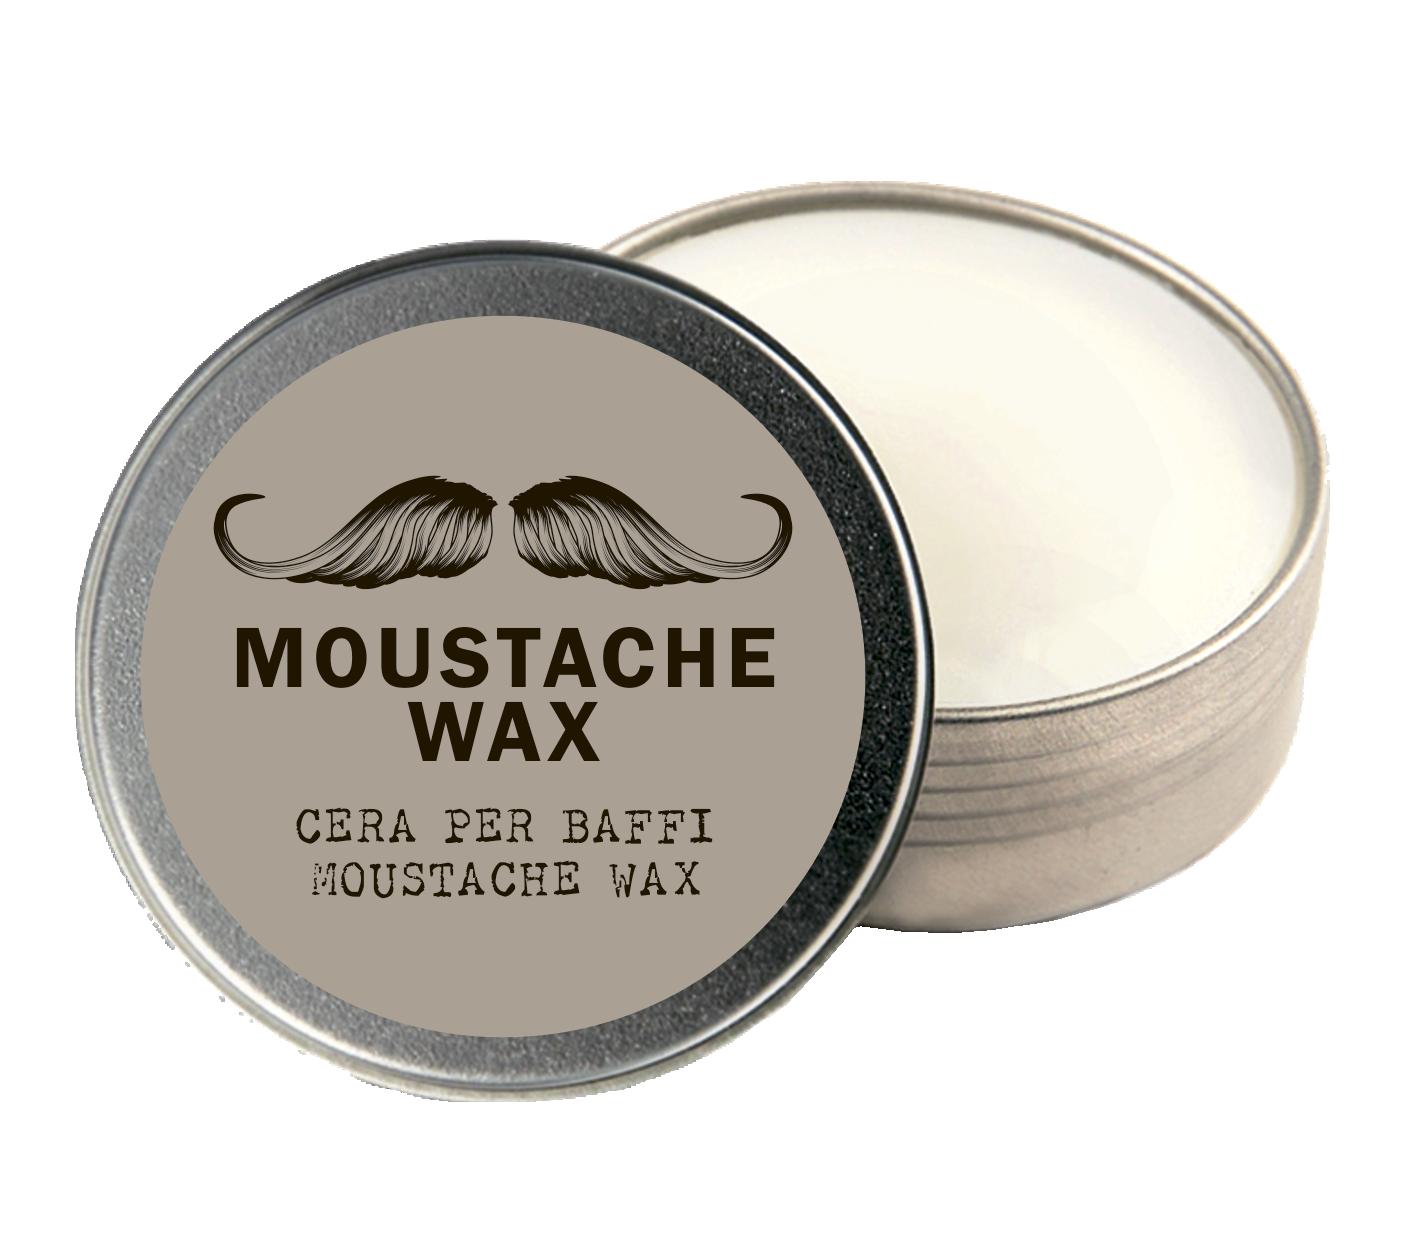 DEAR BEARD Воск-стайлинг для усов / MOUSTACHE WAX 30 мл